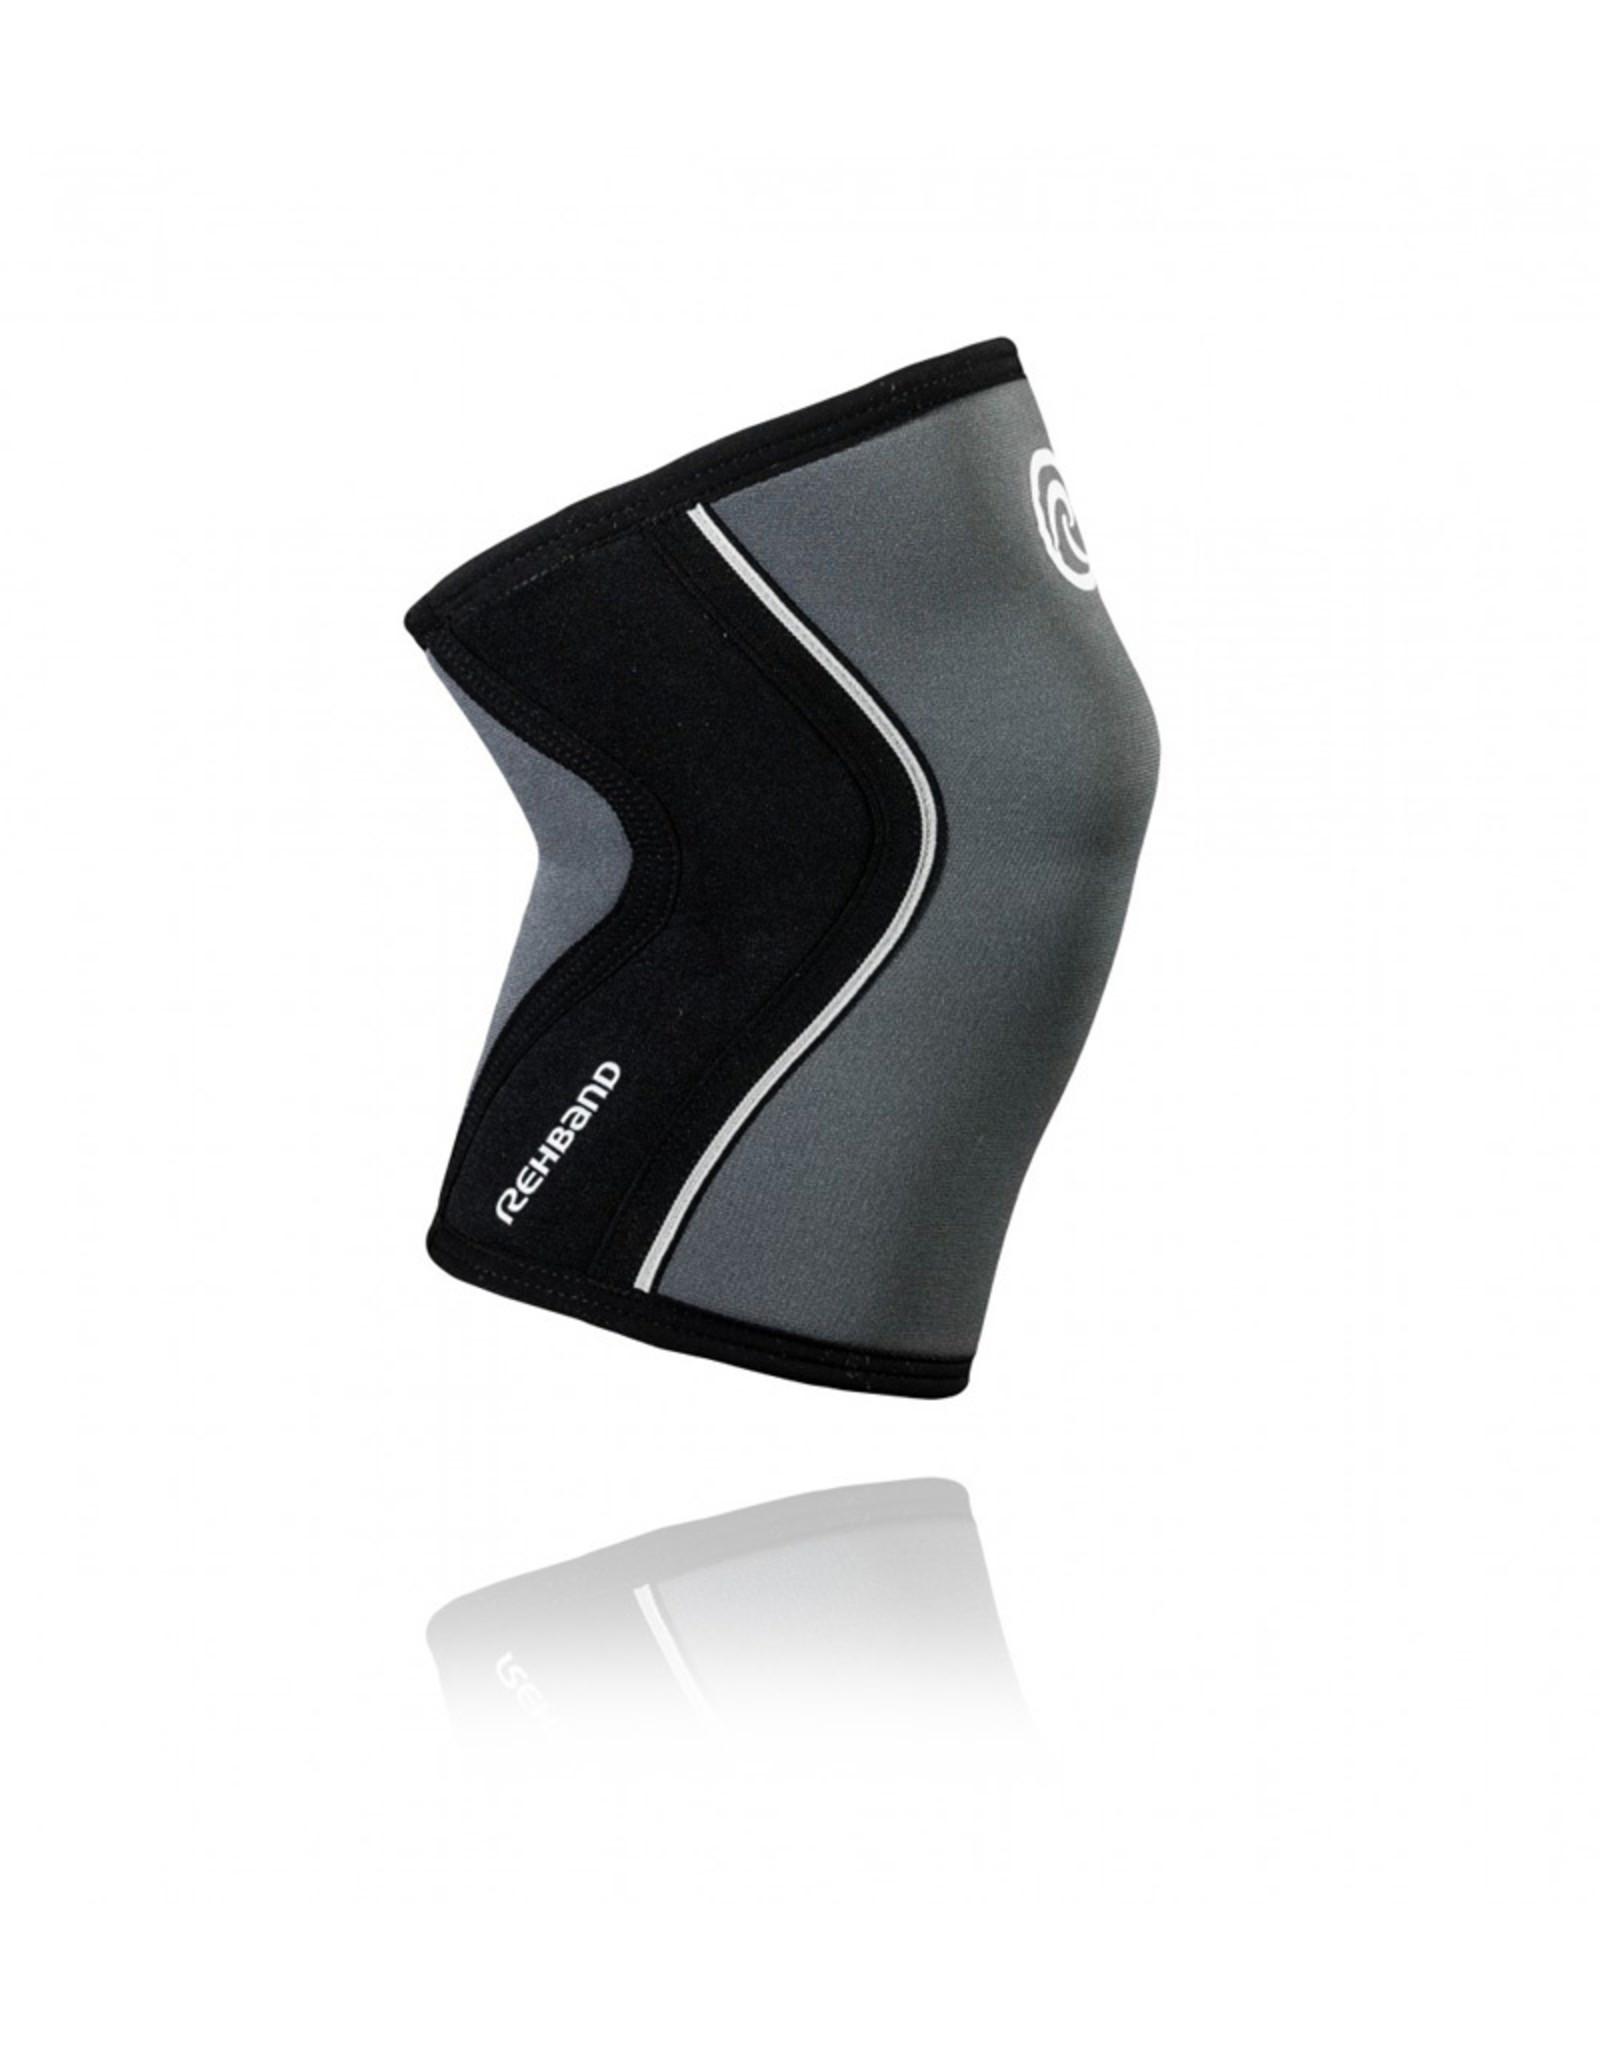 Rehband Rx Knee Sleeve 7Mm Kniebrace - Grijs